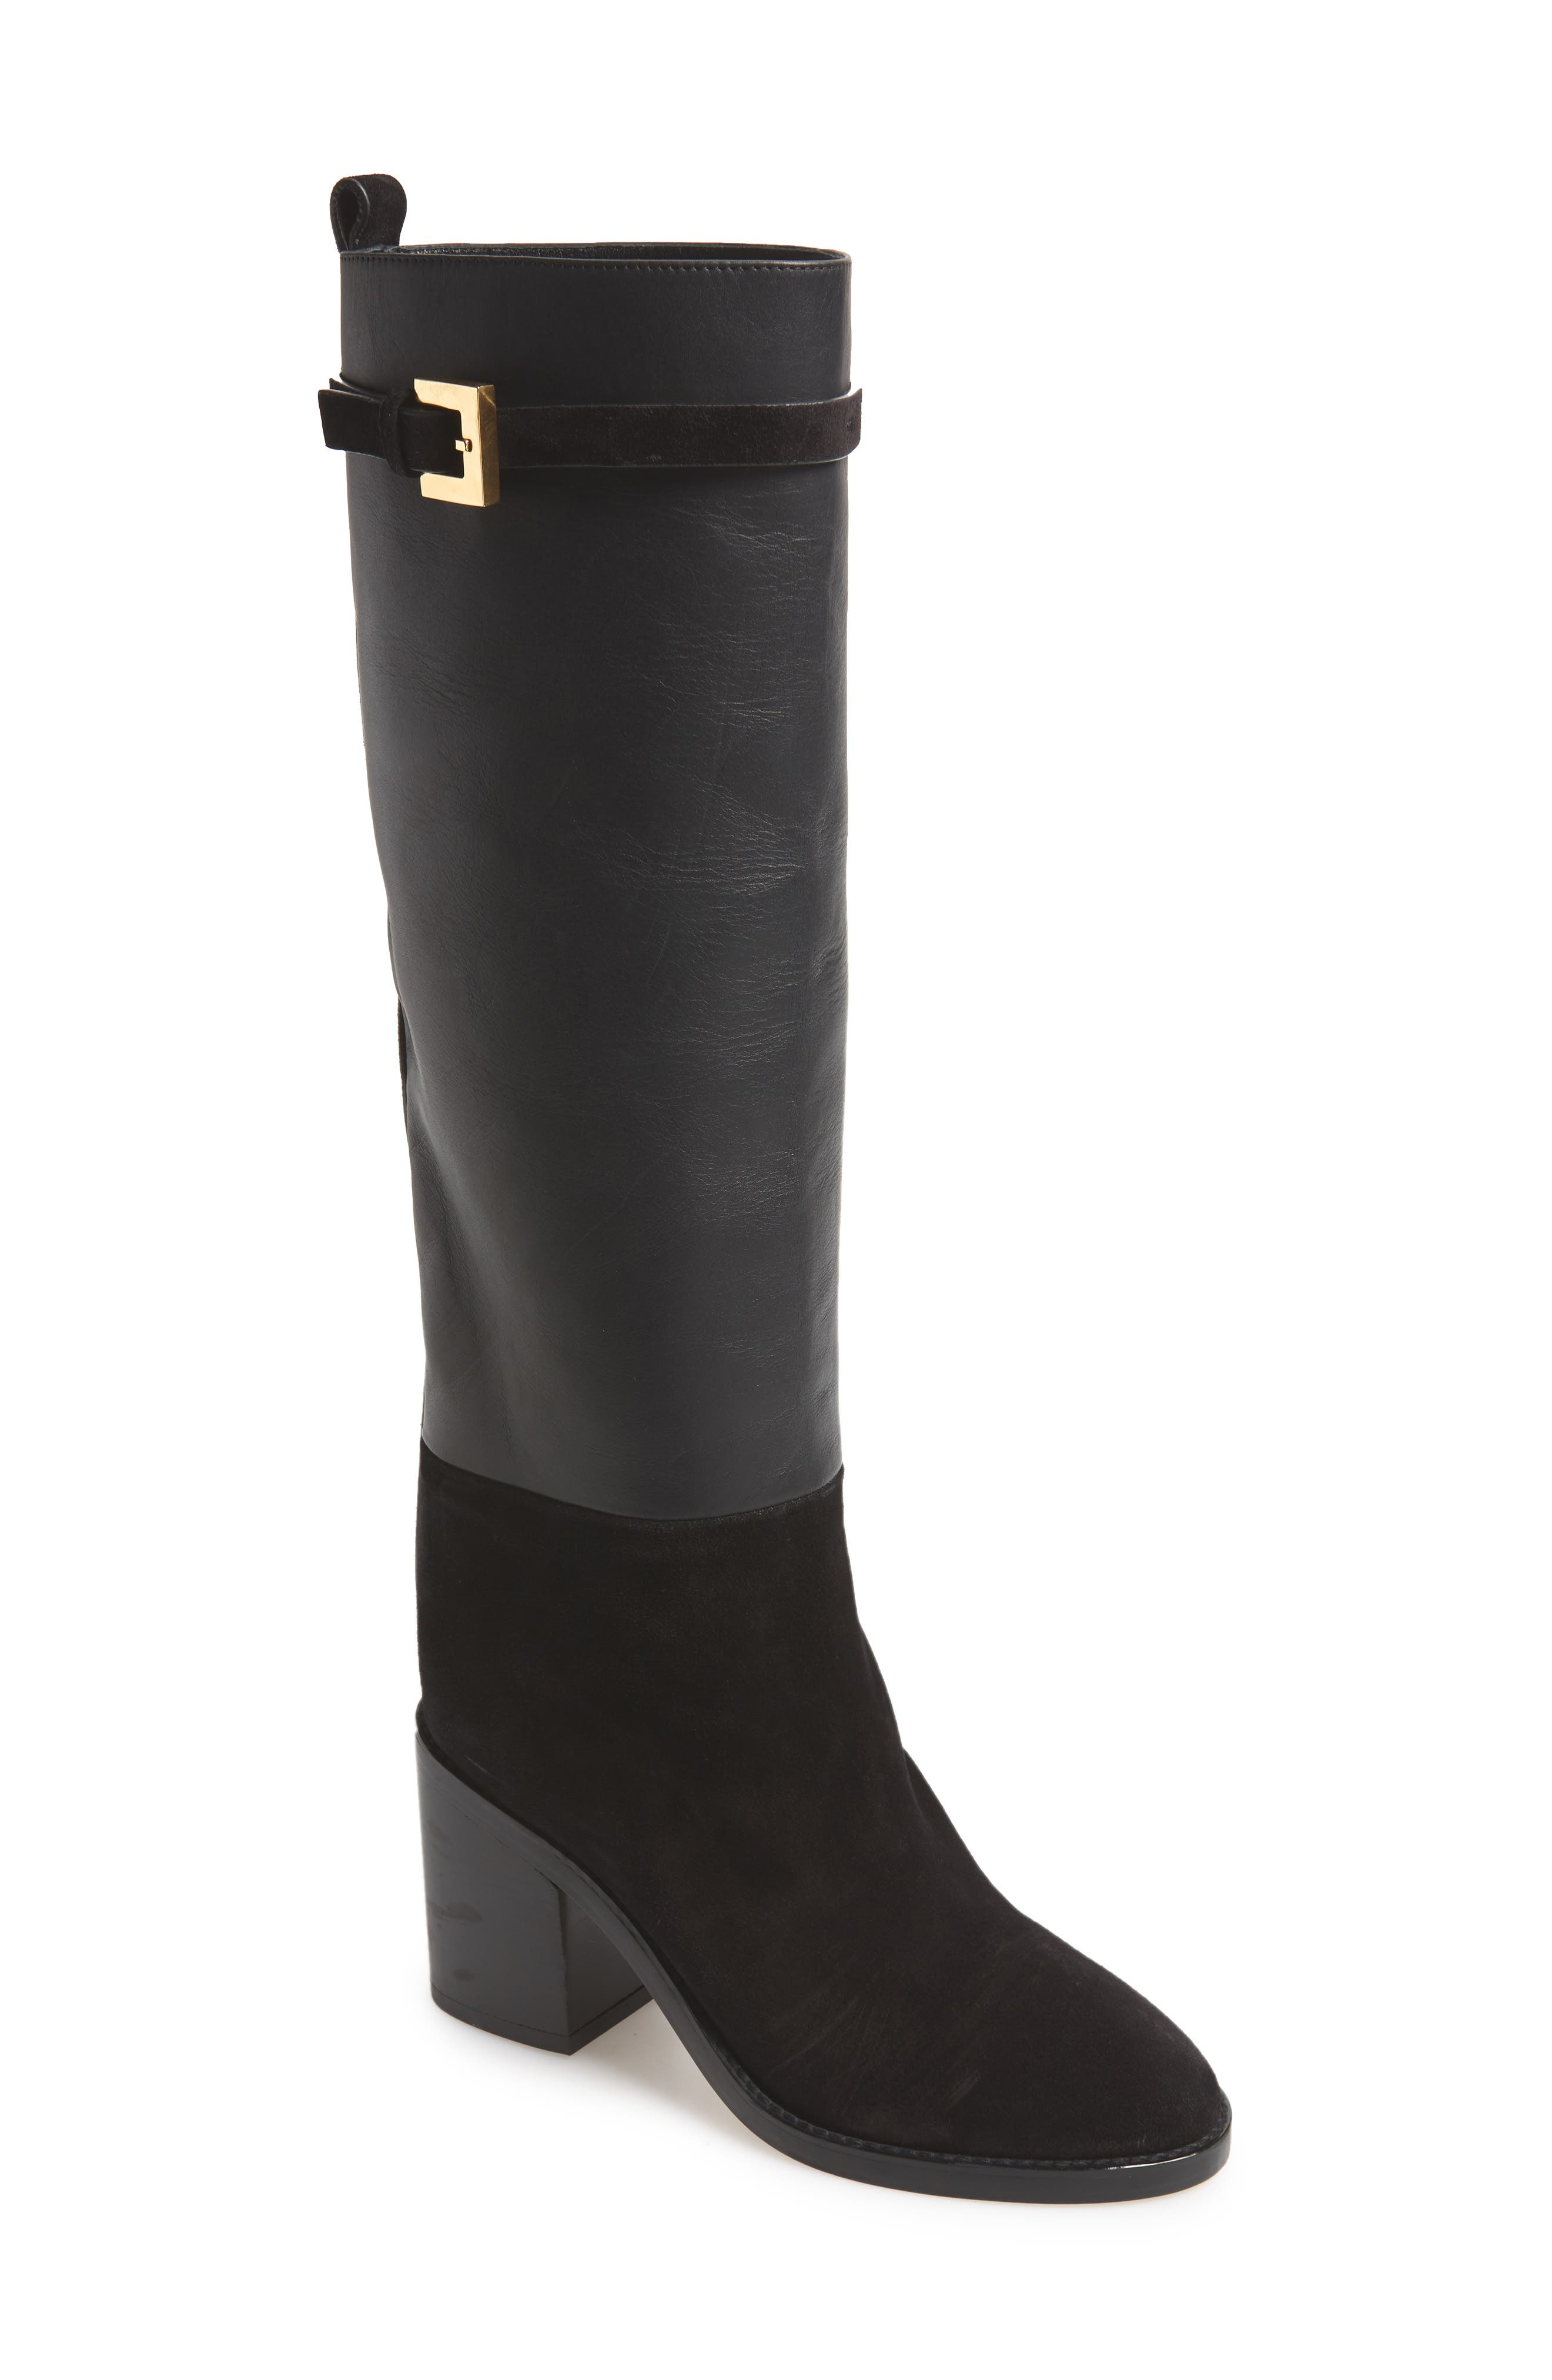 Morrison Knee High Boot,                         Main,                         color, BLACK FEZ